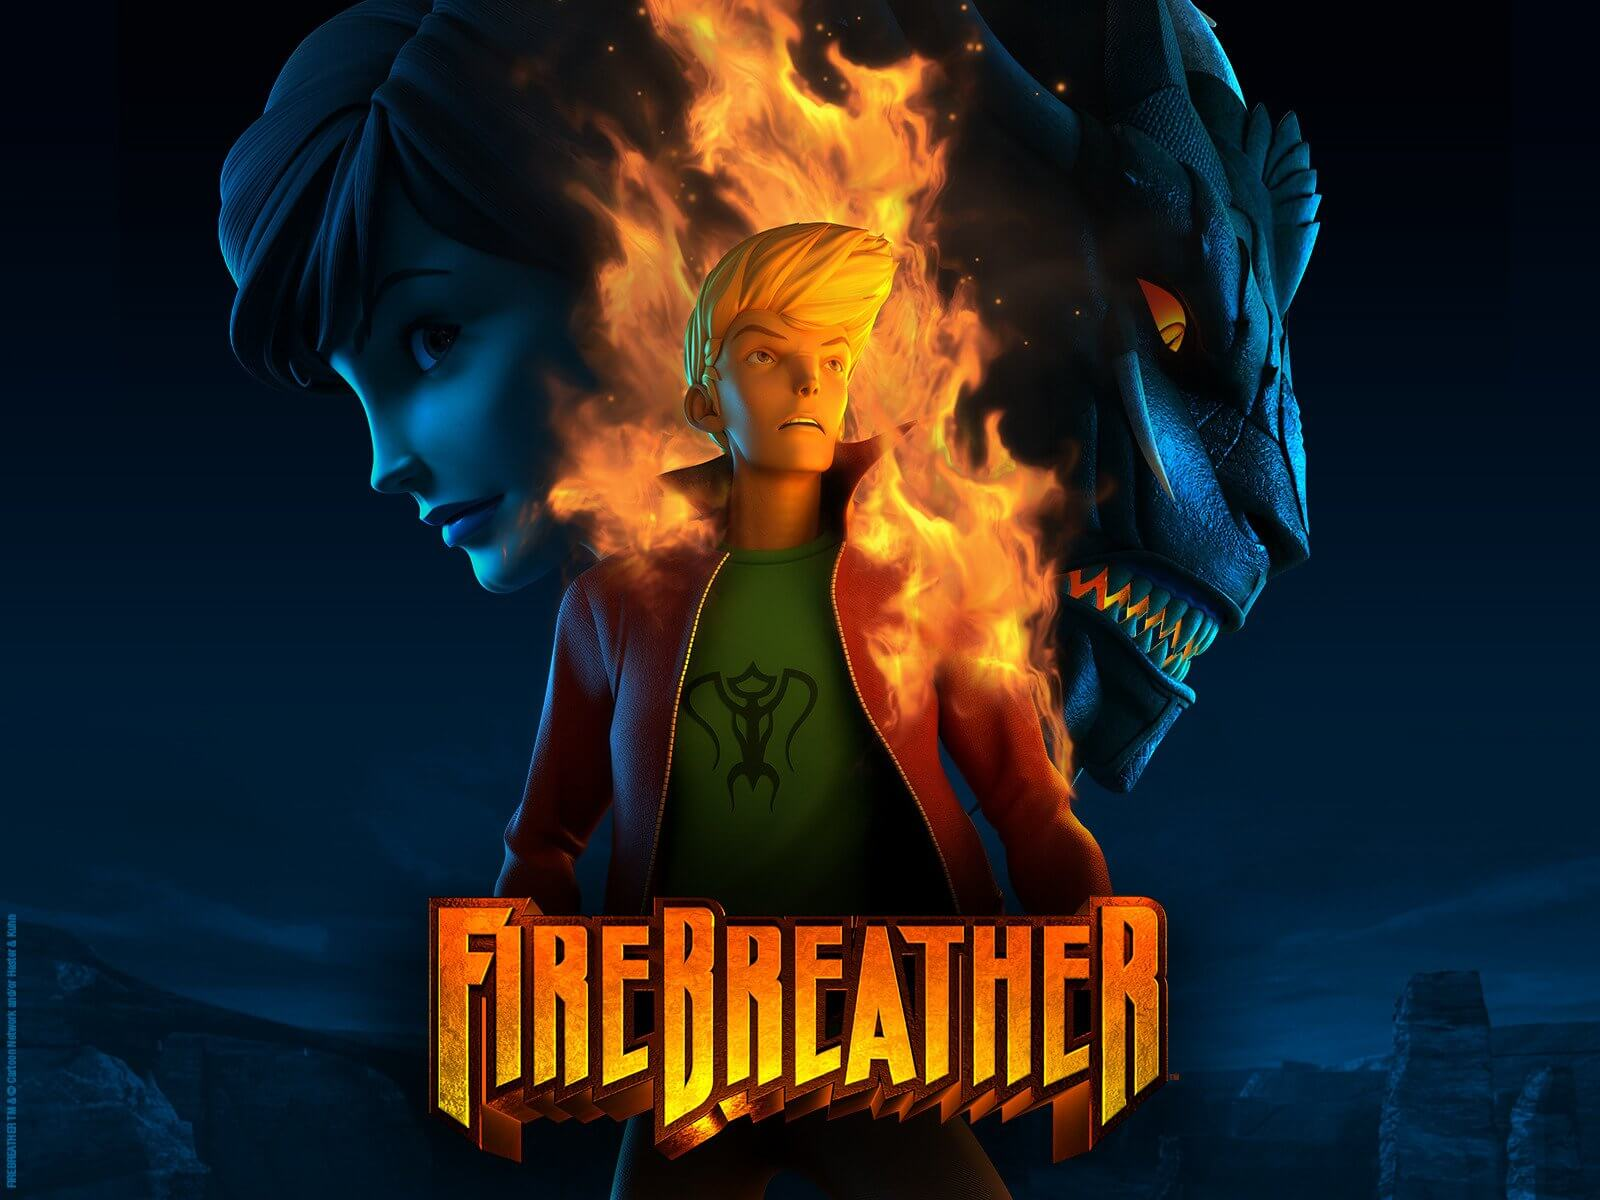 فيلم انيميشن Firebreather بلوراي 1080P مترجم اون لاين تحميل و مشاهدة